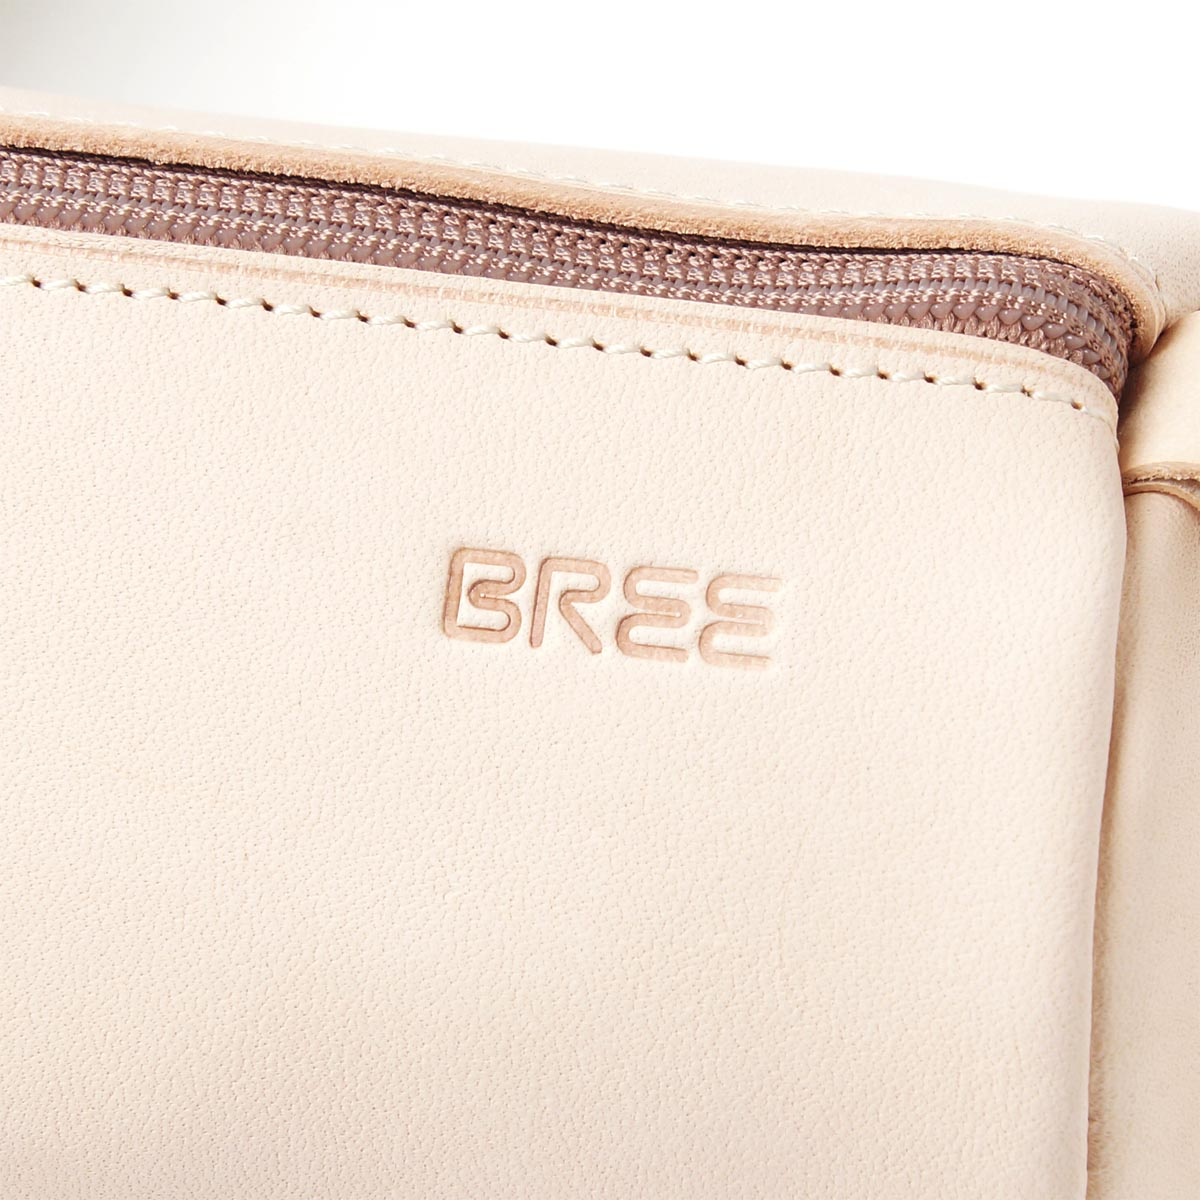 BREE ブリー ペンケース/J27